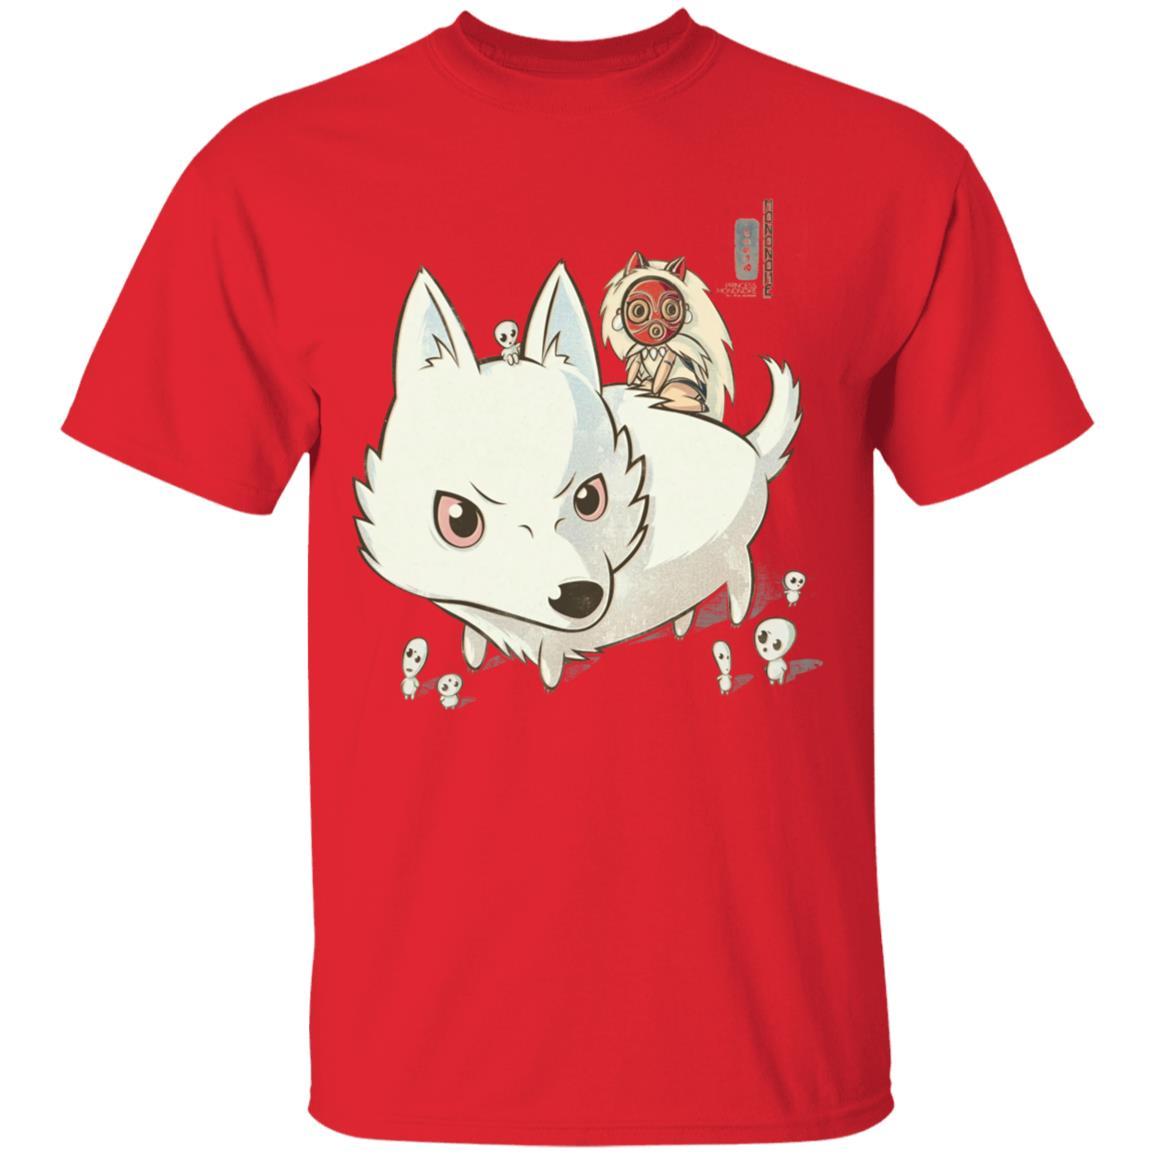 Princess Mononoke and The Wolf Cute Chibi Version T Shirt